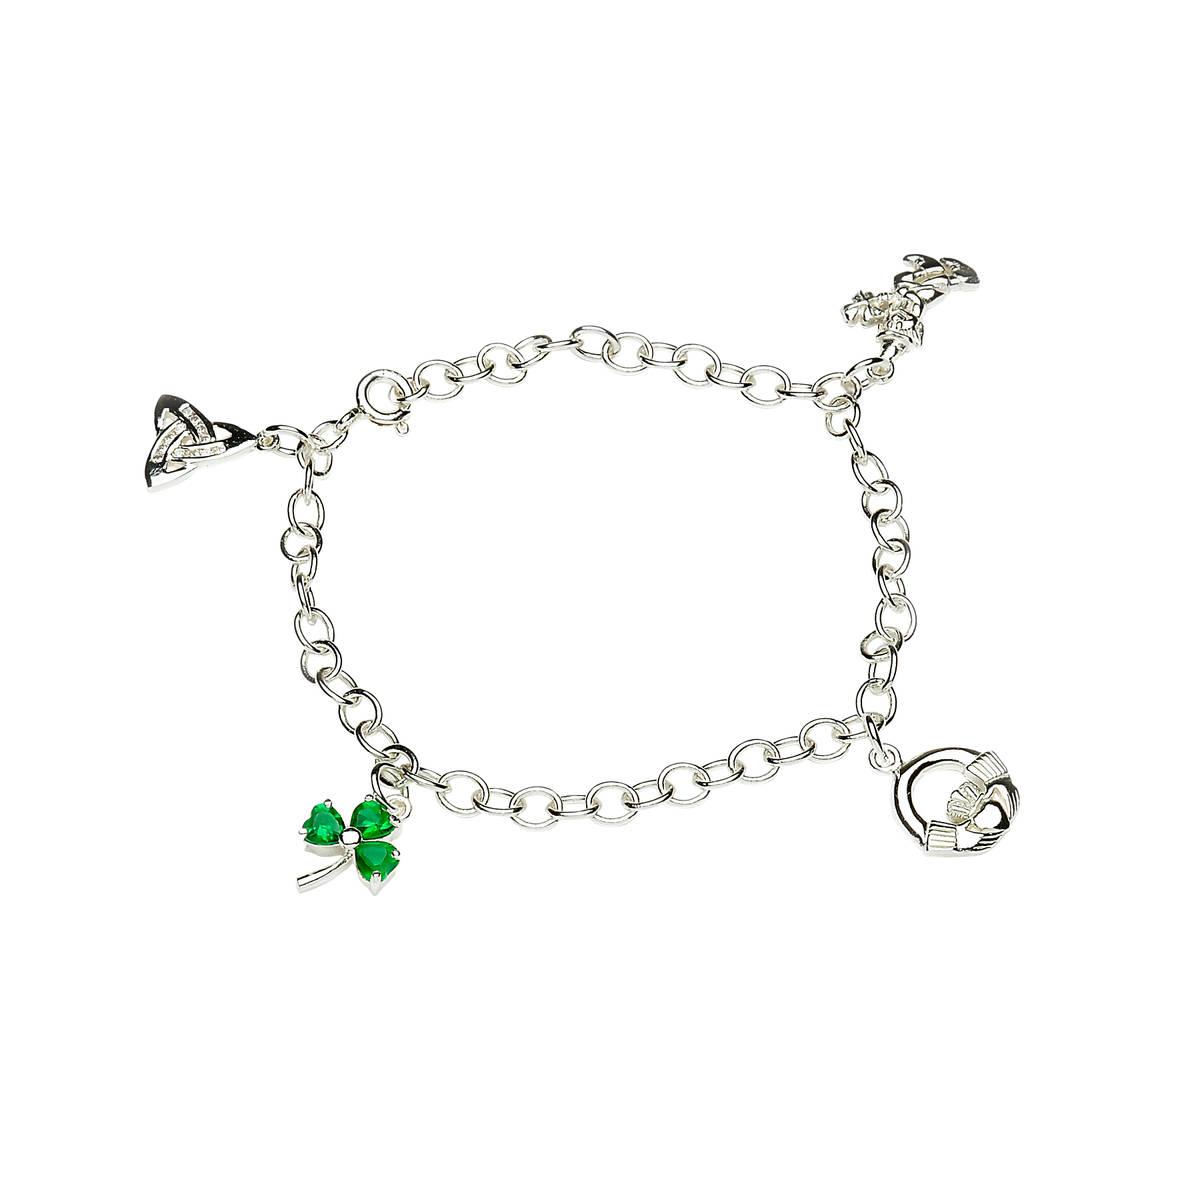 Silver Charm Bracelet Trinity,claddagh,shamrock,leprechaun